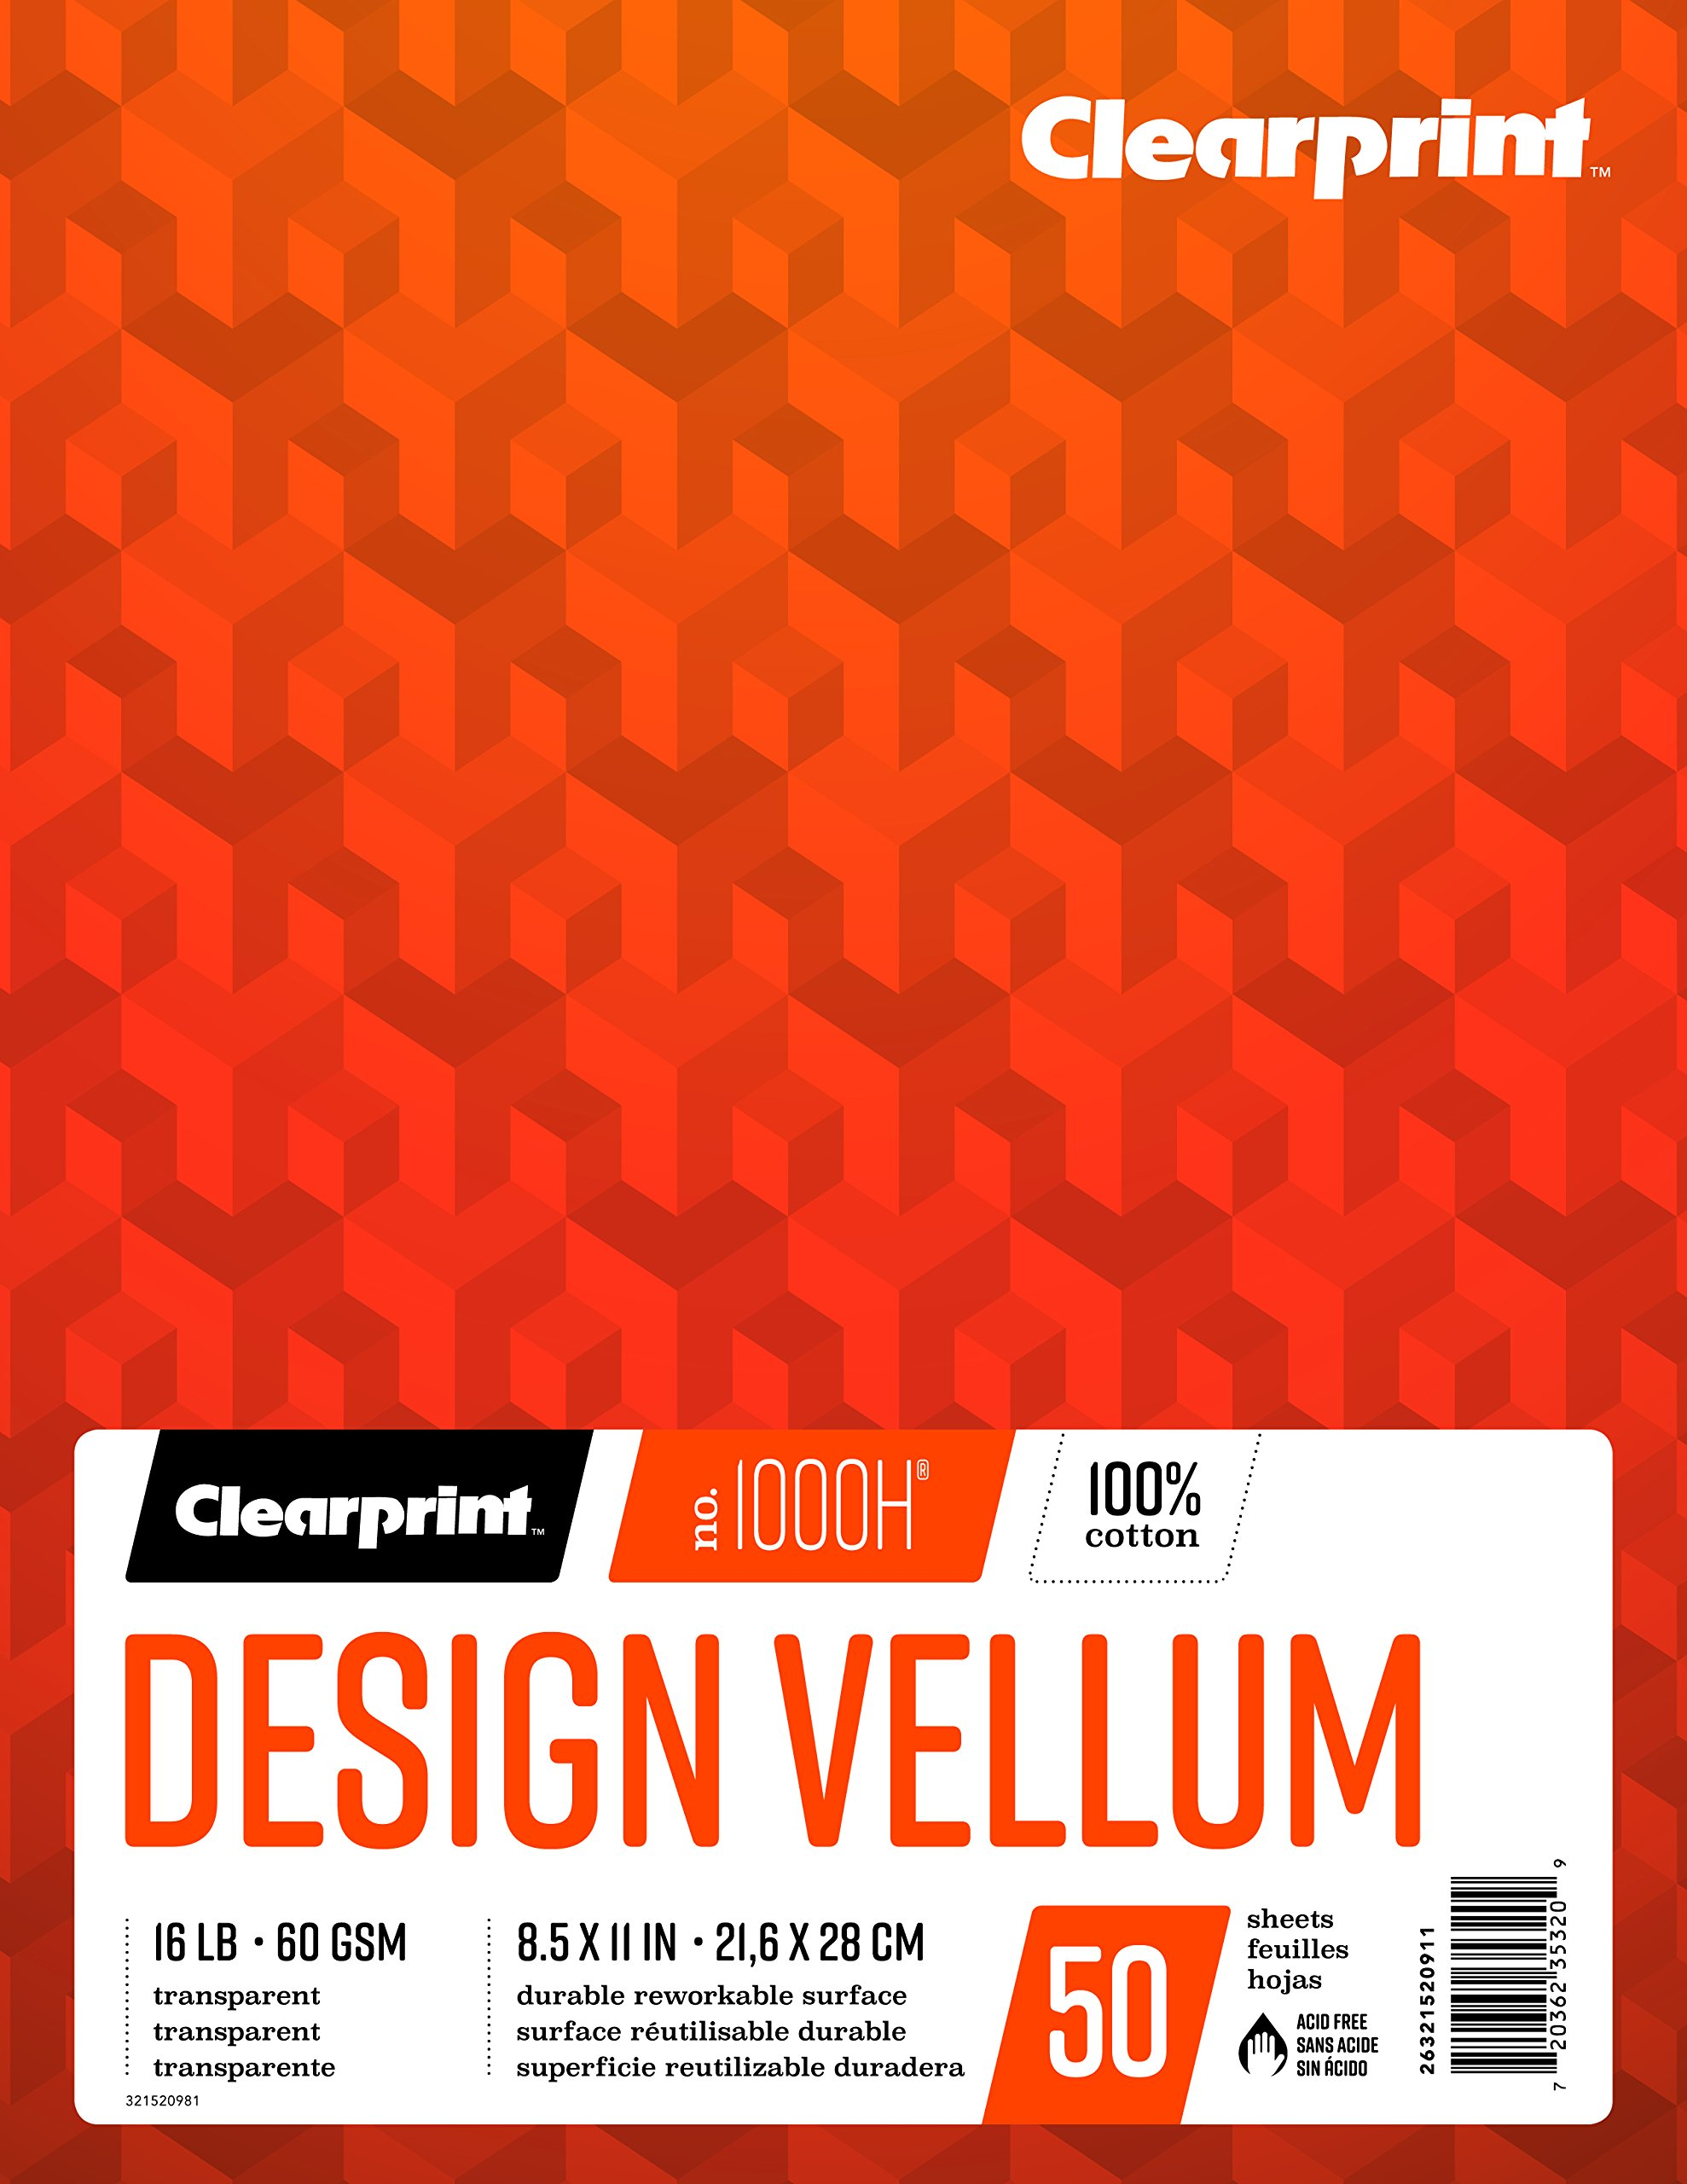 Clearprint 1000H 100% Cotton Design Vellum Pad, 16 LB, 60 GSM, 8.5 x 11 Inches, 50 Sheets Per Pad, 1 Each (26321520911)